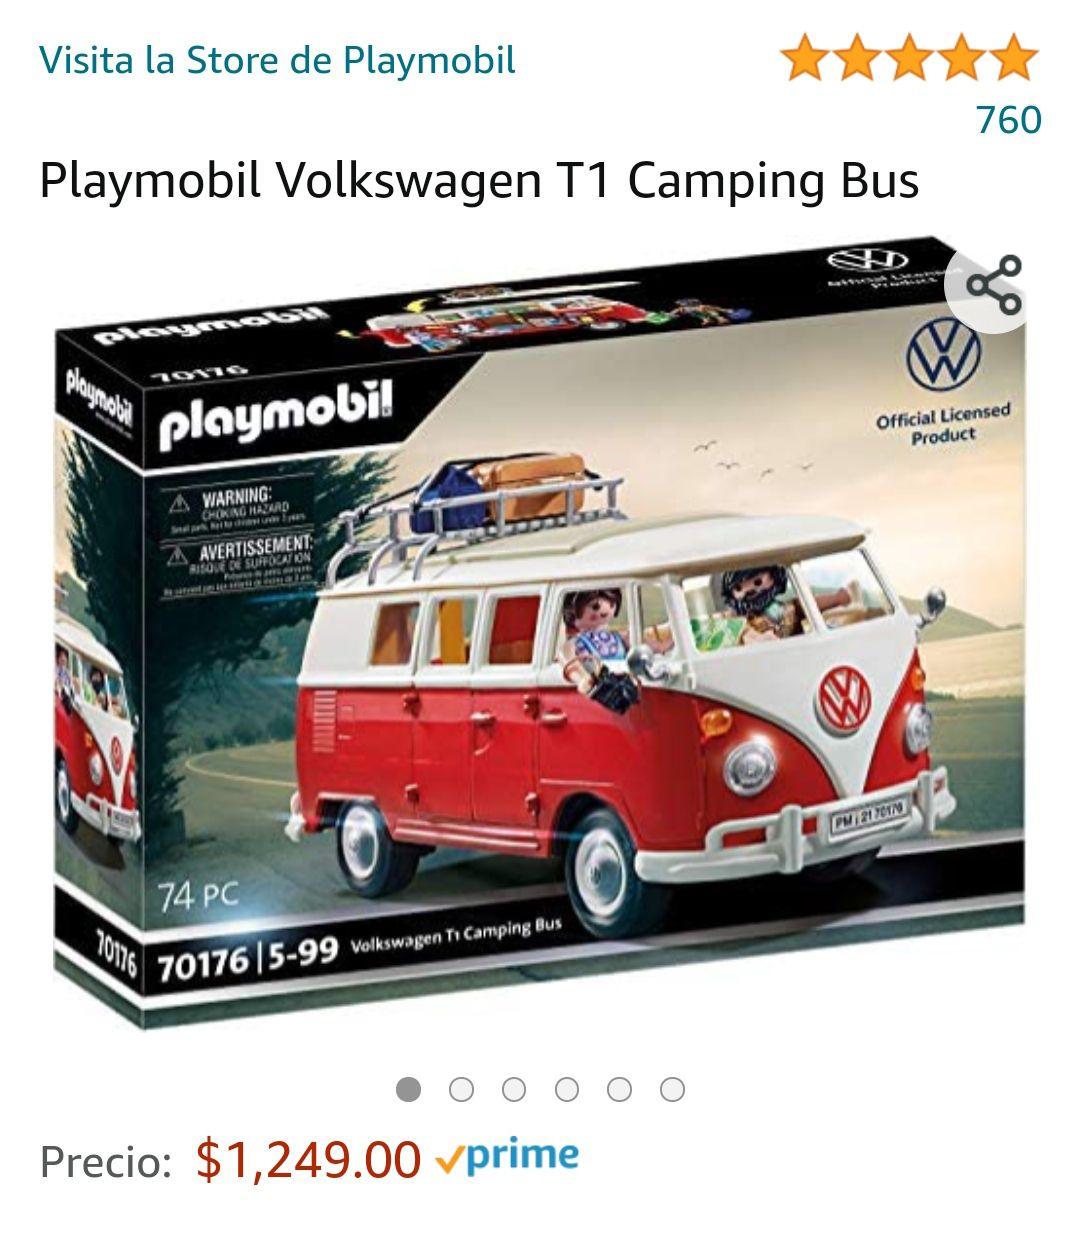 Amazon: Playmobil Volkswagen T1 Camping Bus